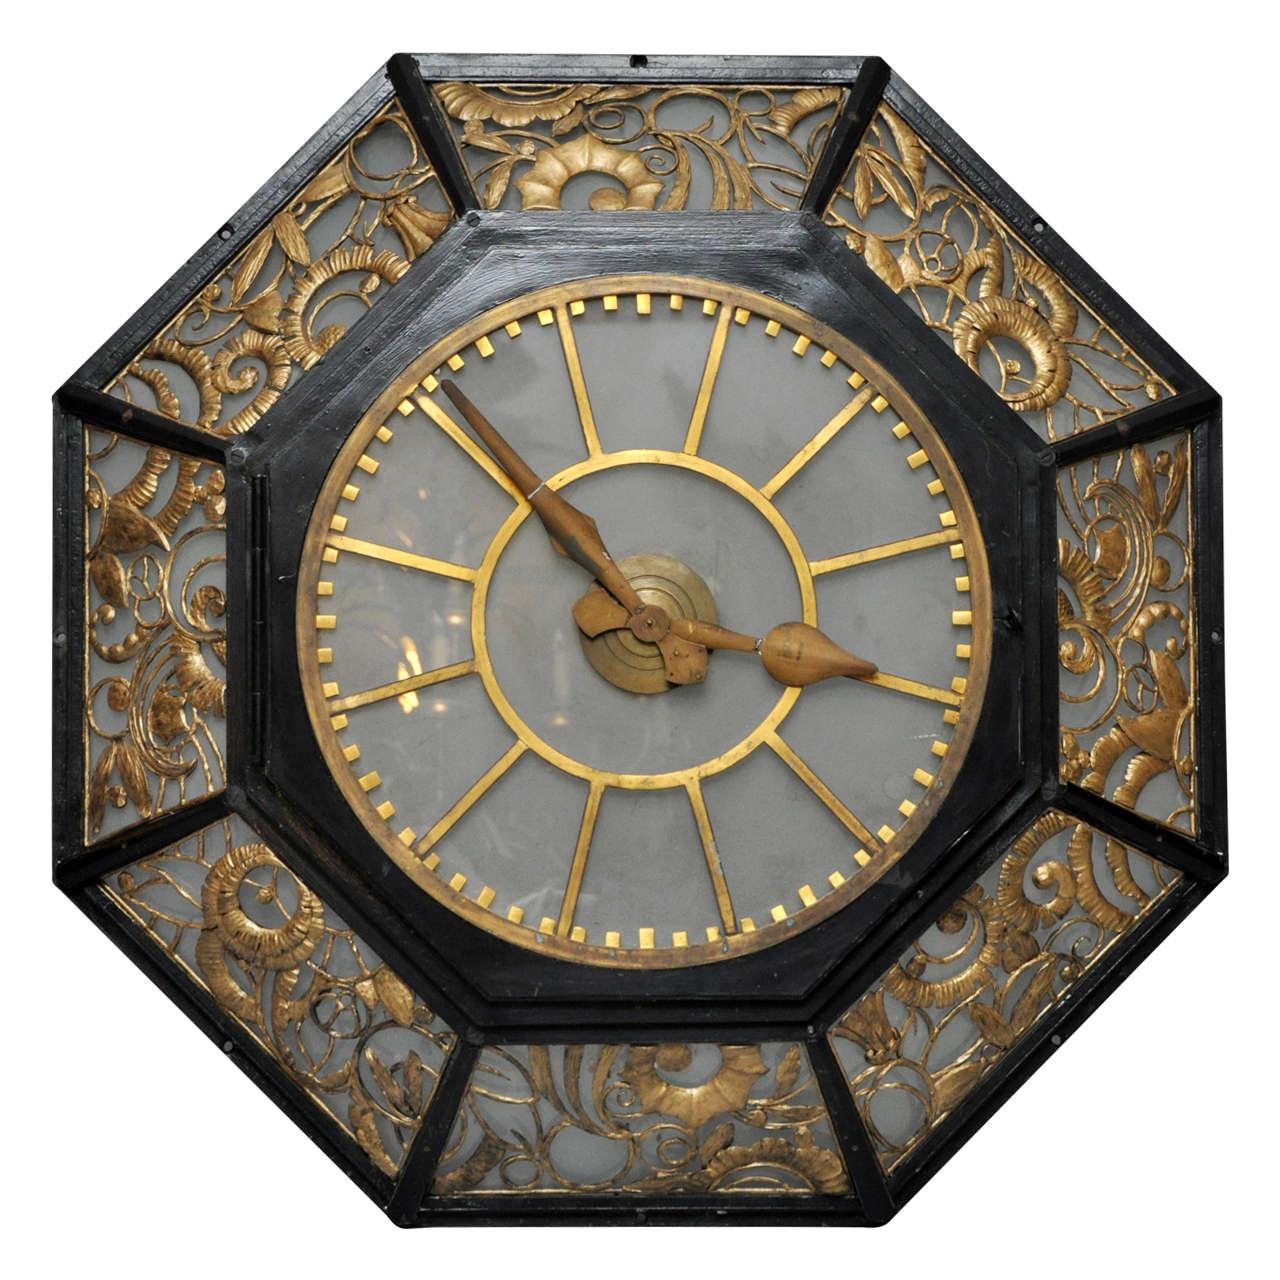 French Art Deco Wall Clock At 1stdibs